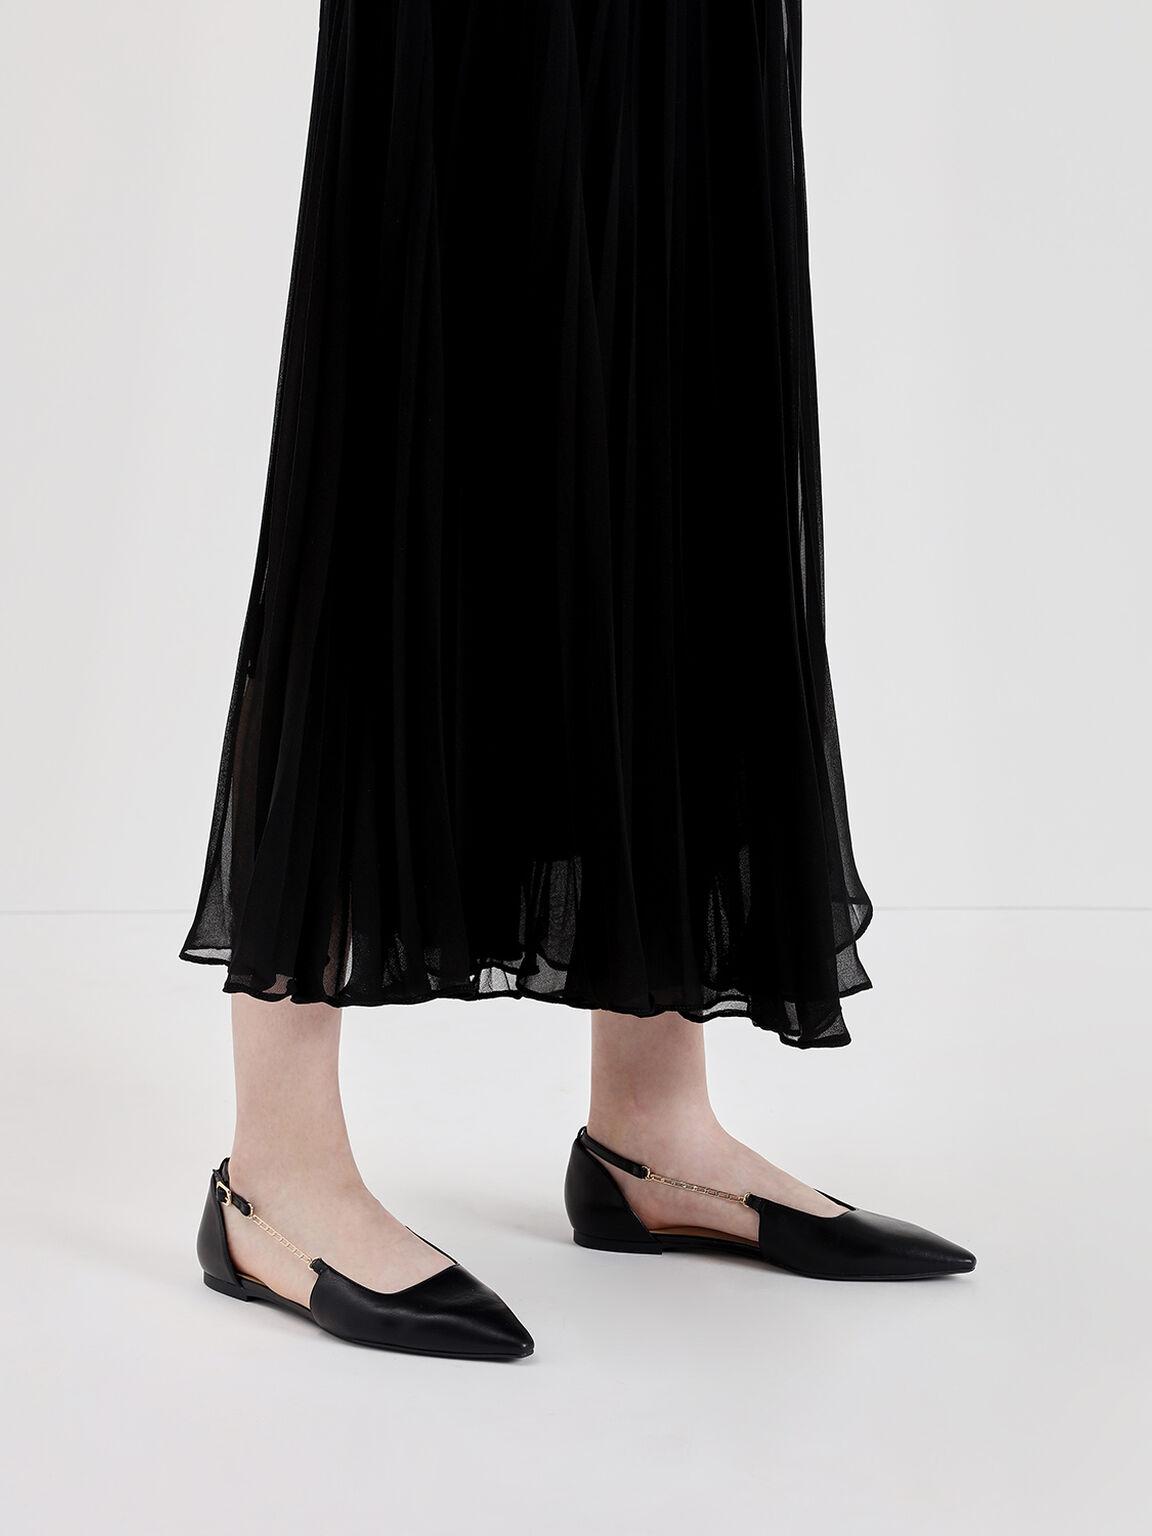 Chain Strap Ballerina Flats, Black, hi-res